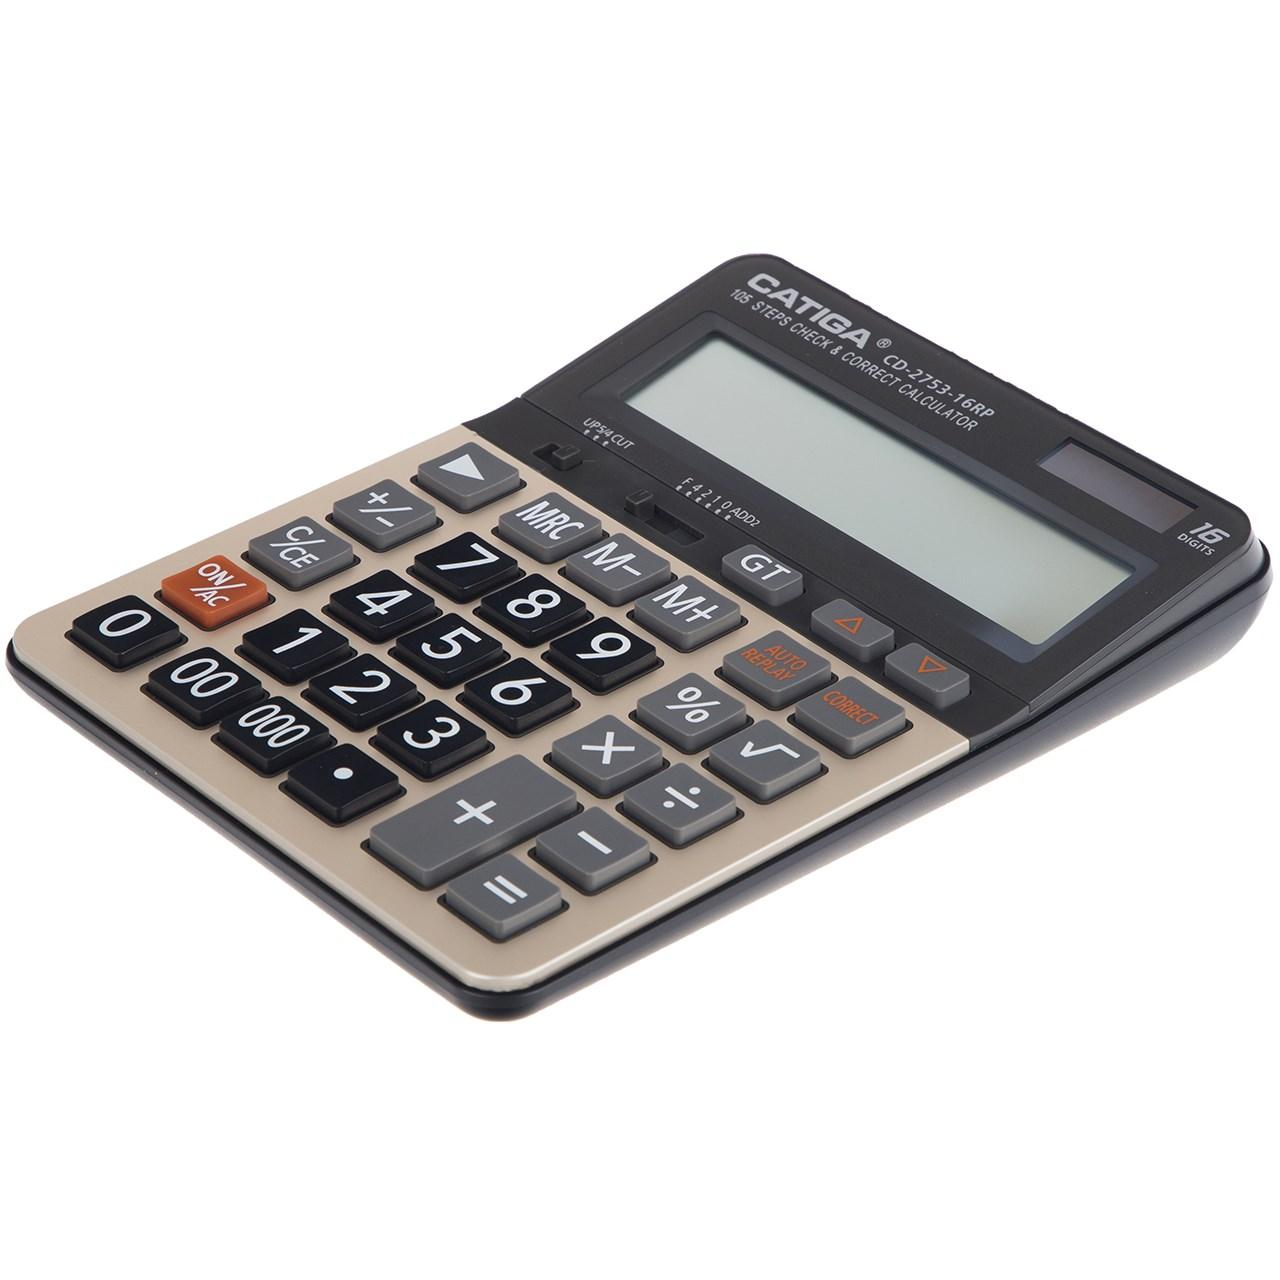 قیمت                      ماشین حساب کاتیگا مدل Catiga CD-2753-16RP